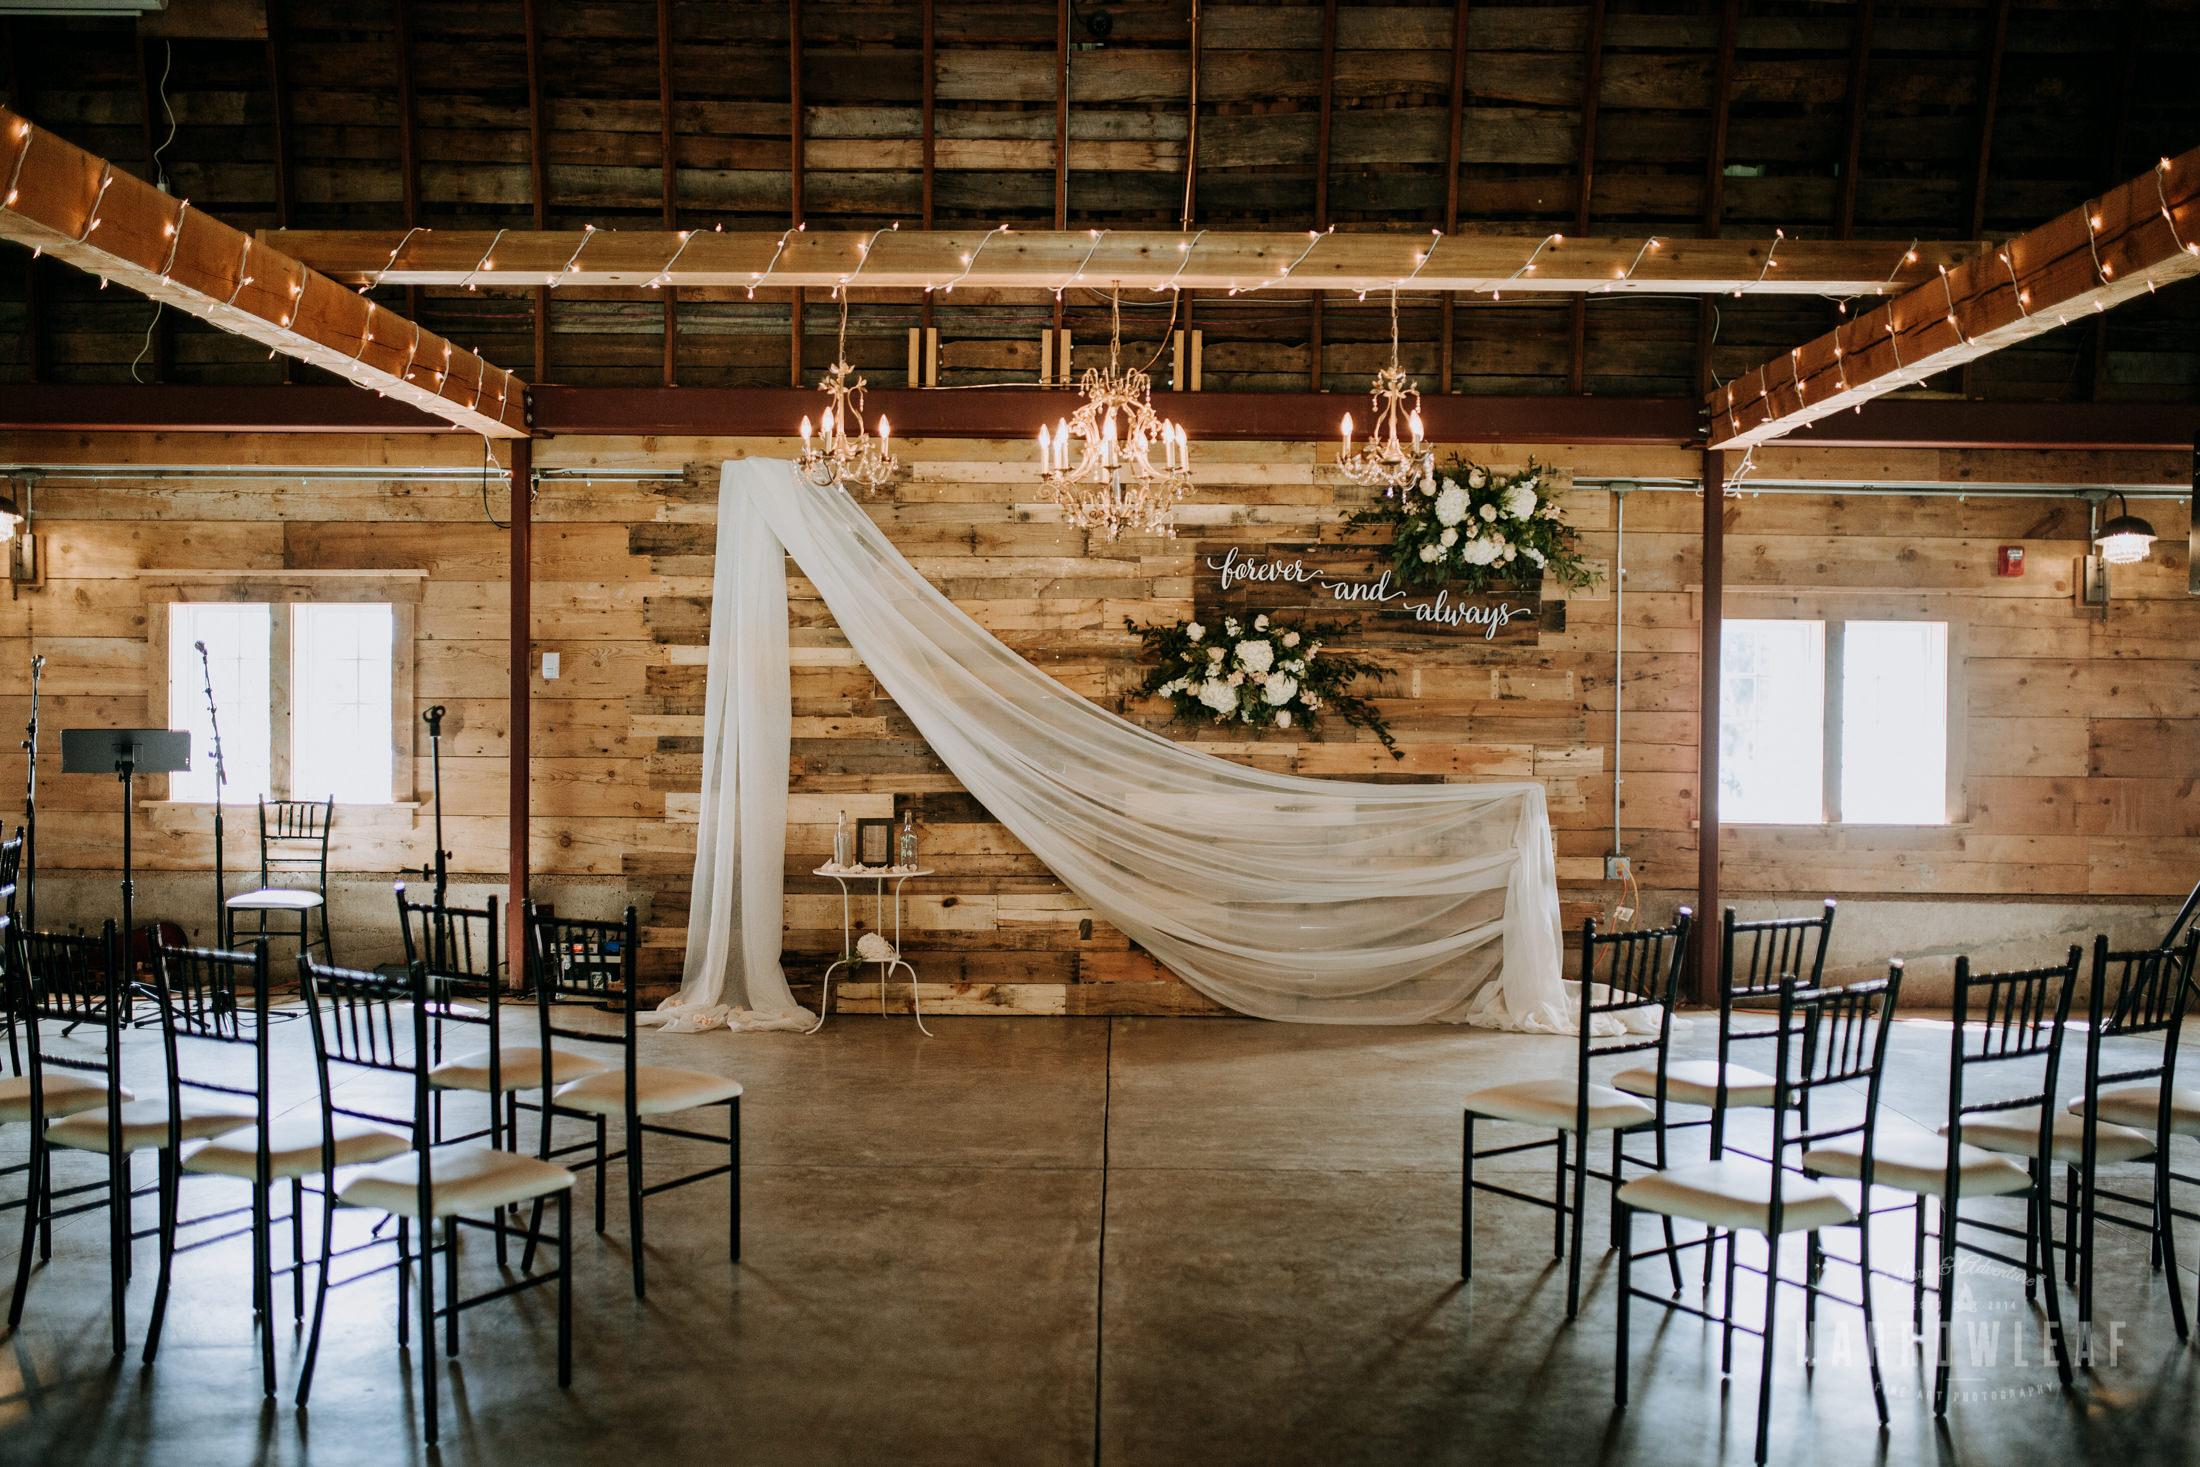 John-P-Furber-Farm-Minnesota-wedding-photographer-Narrowleaf_Love_and_Adventure_Photography-7640.jpg